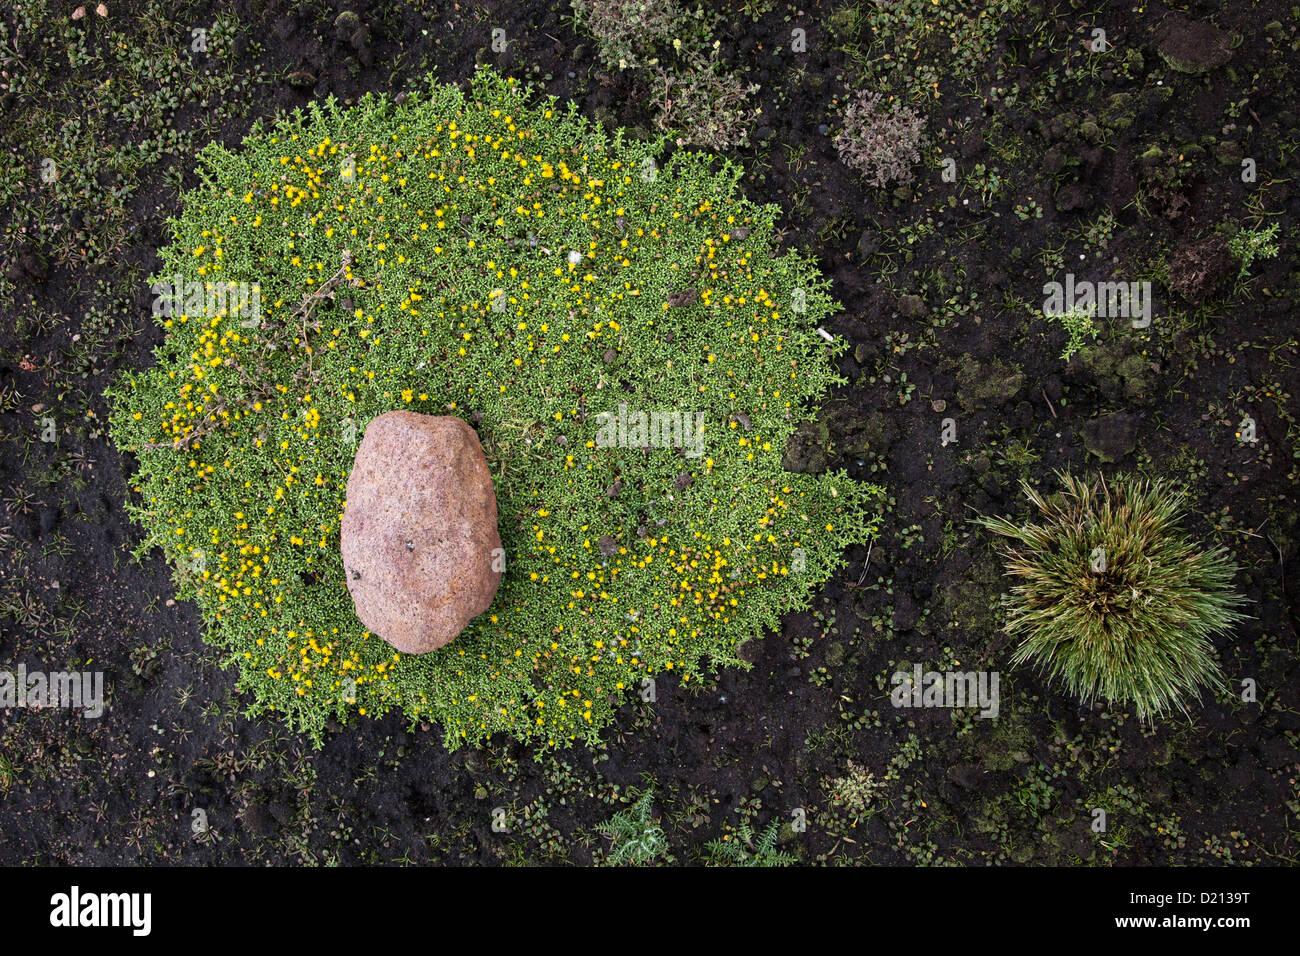 High altitude vegetation at Lauca National Park, near Arica, Tarapaca, Chile, South America - Stock Image